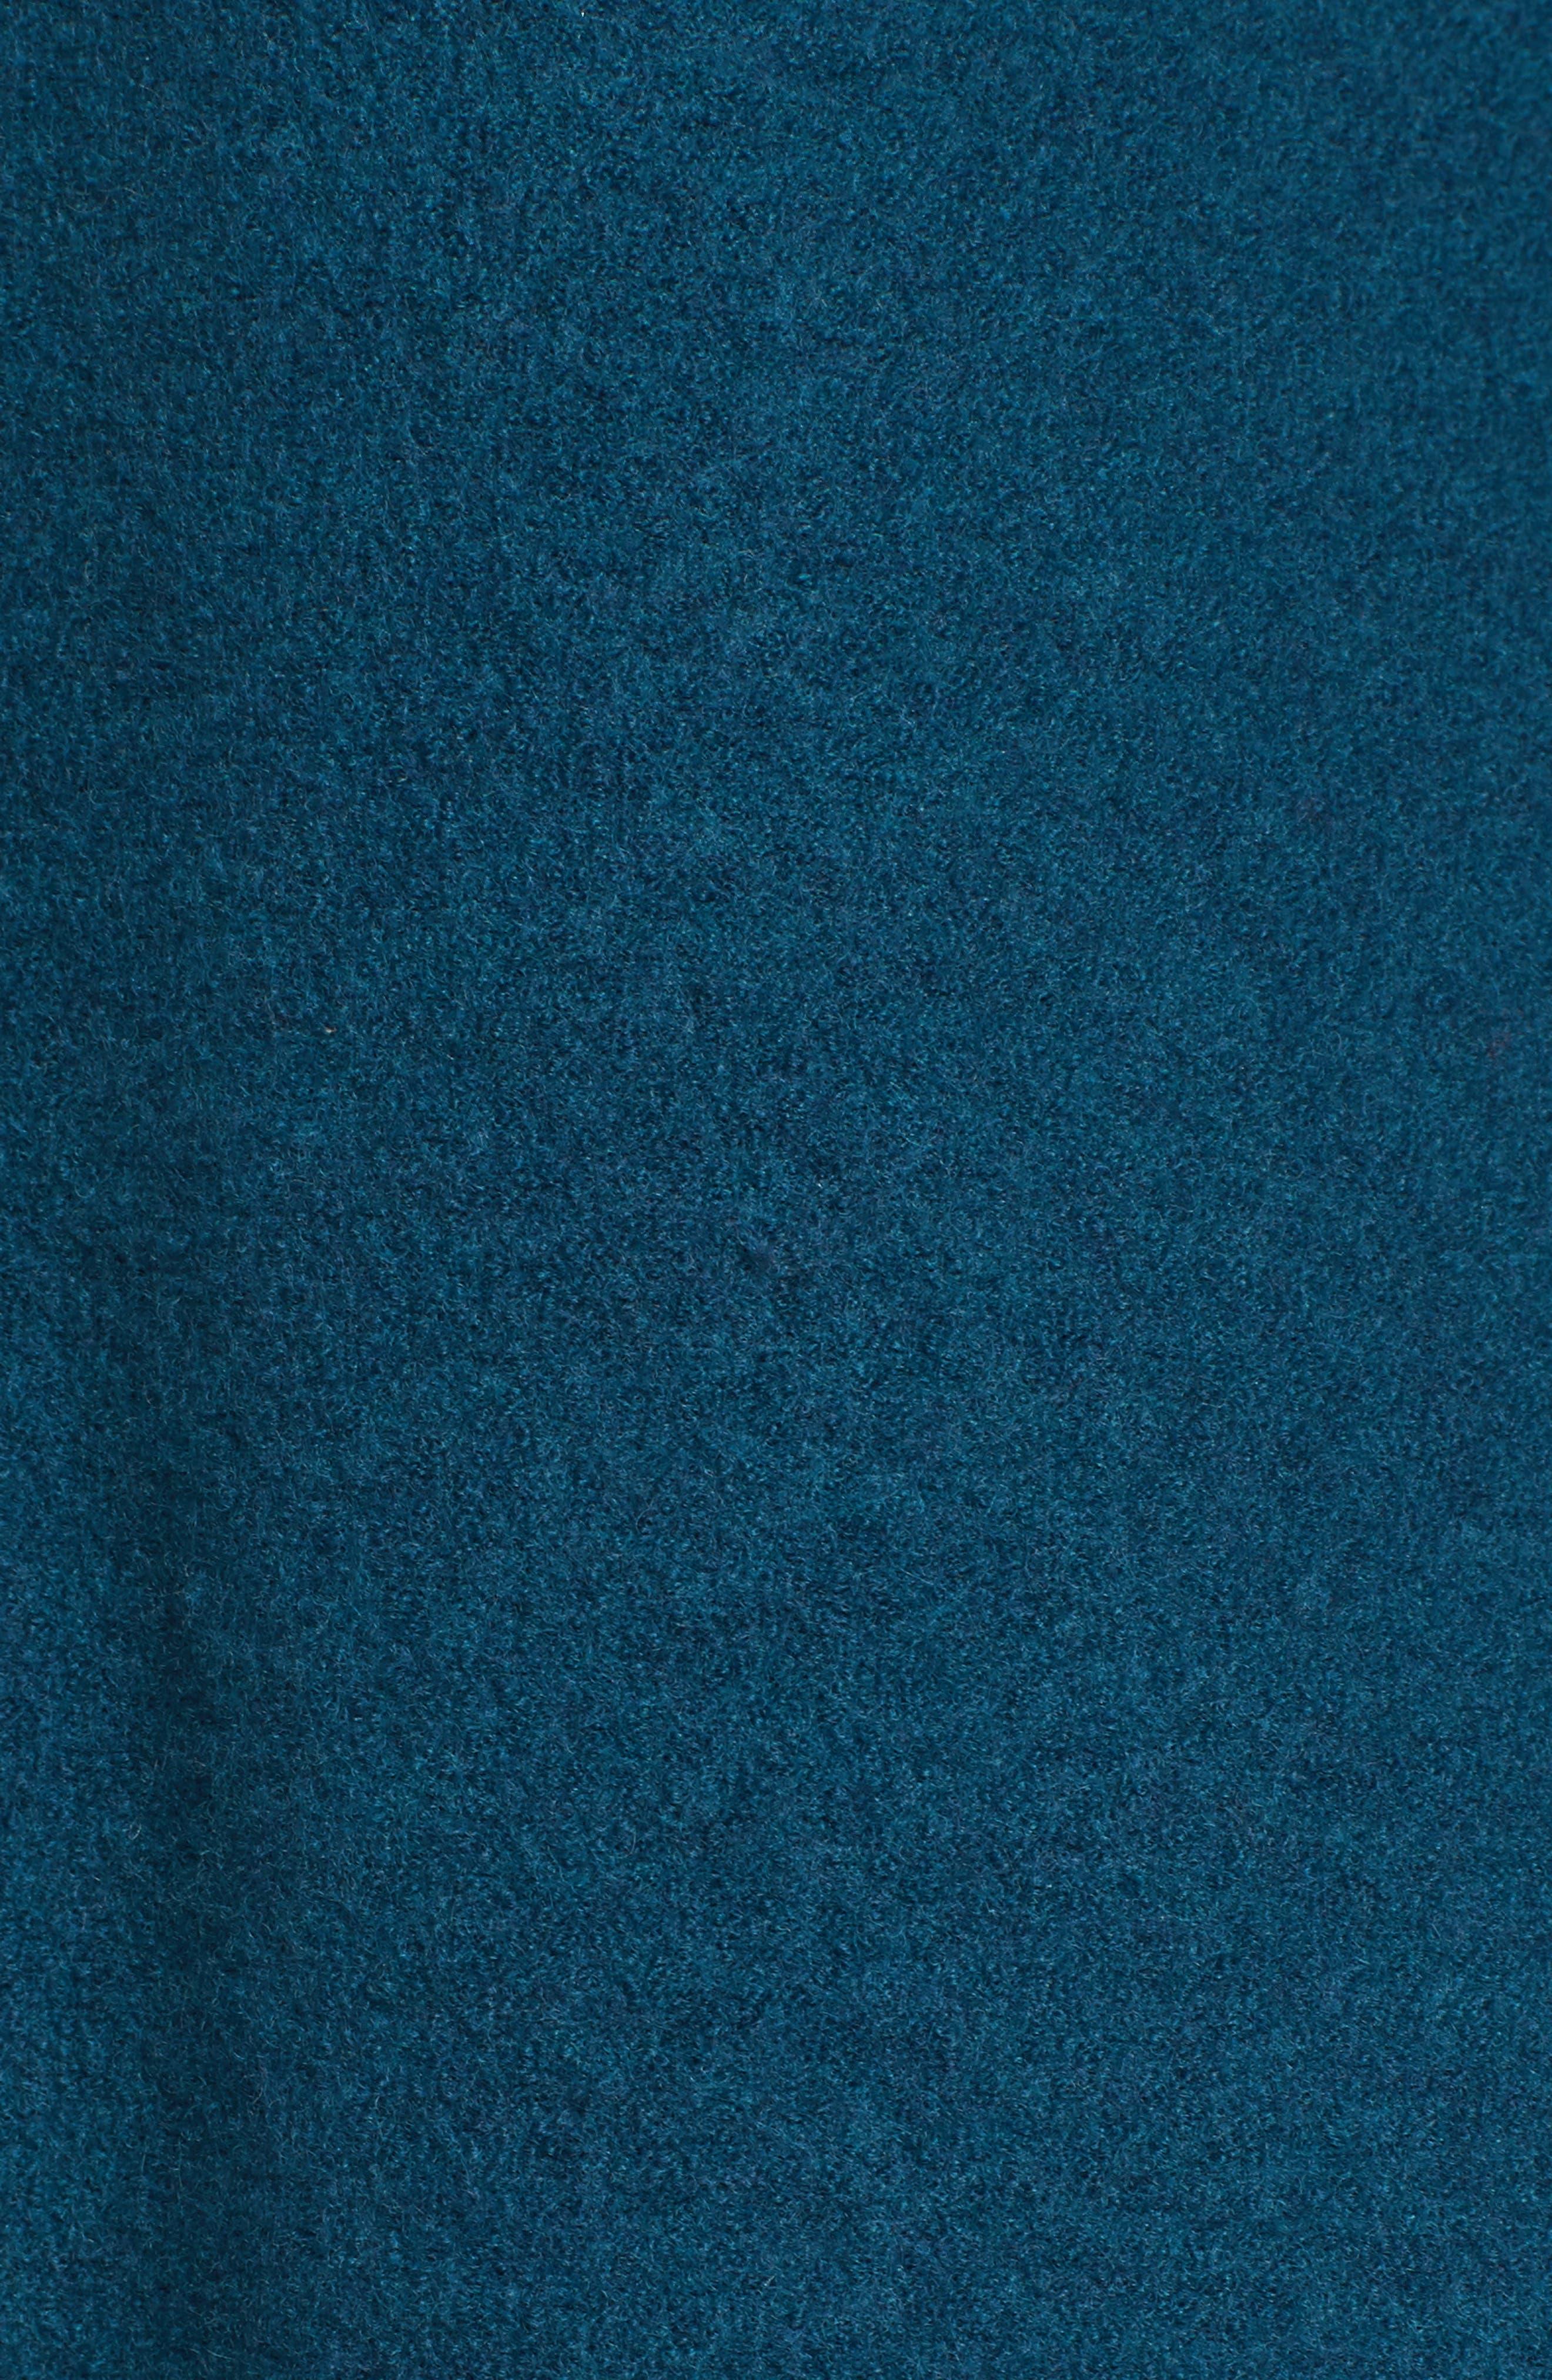 Boiled Merino Wool Top,                             Alternate thumbnail 5, color,                             Blue Spruce